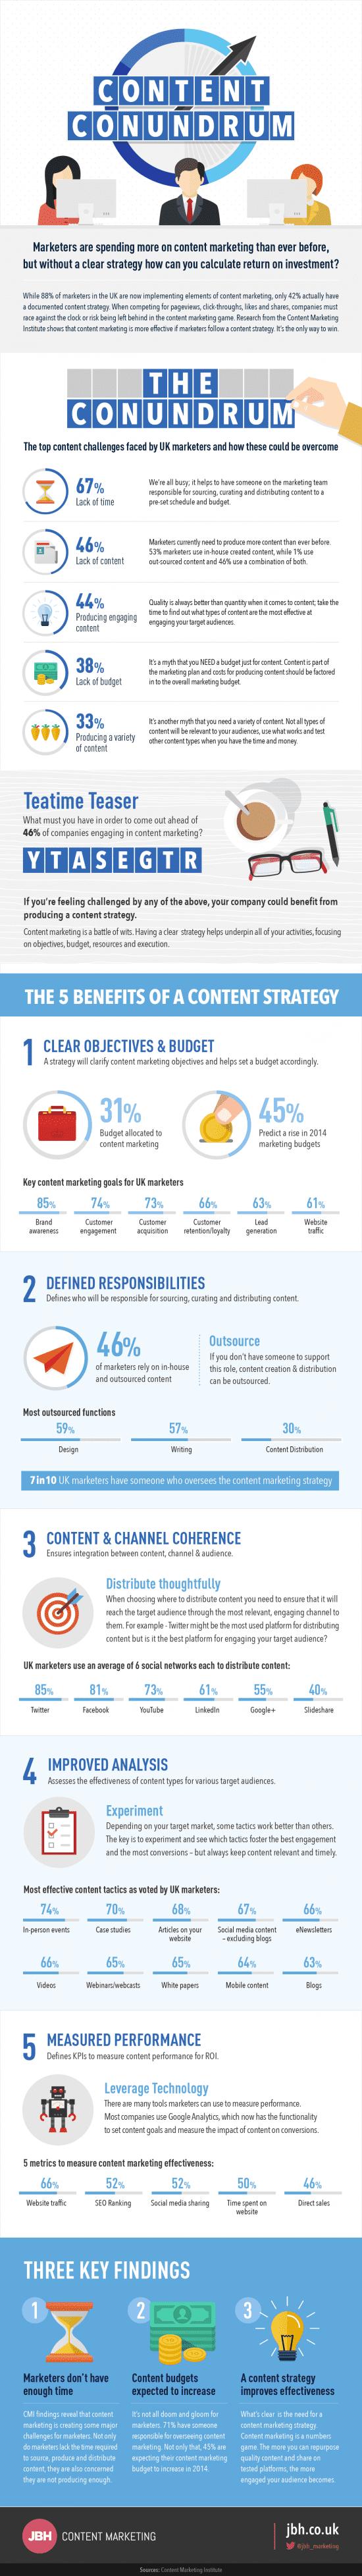 Content-Marketing-Conundrum-Infographic